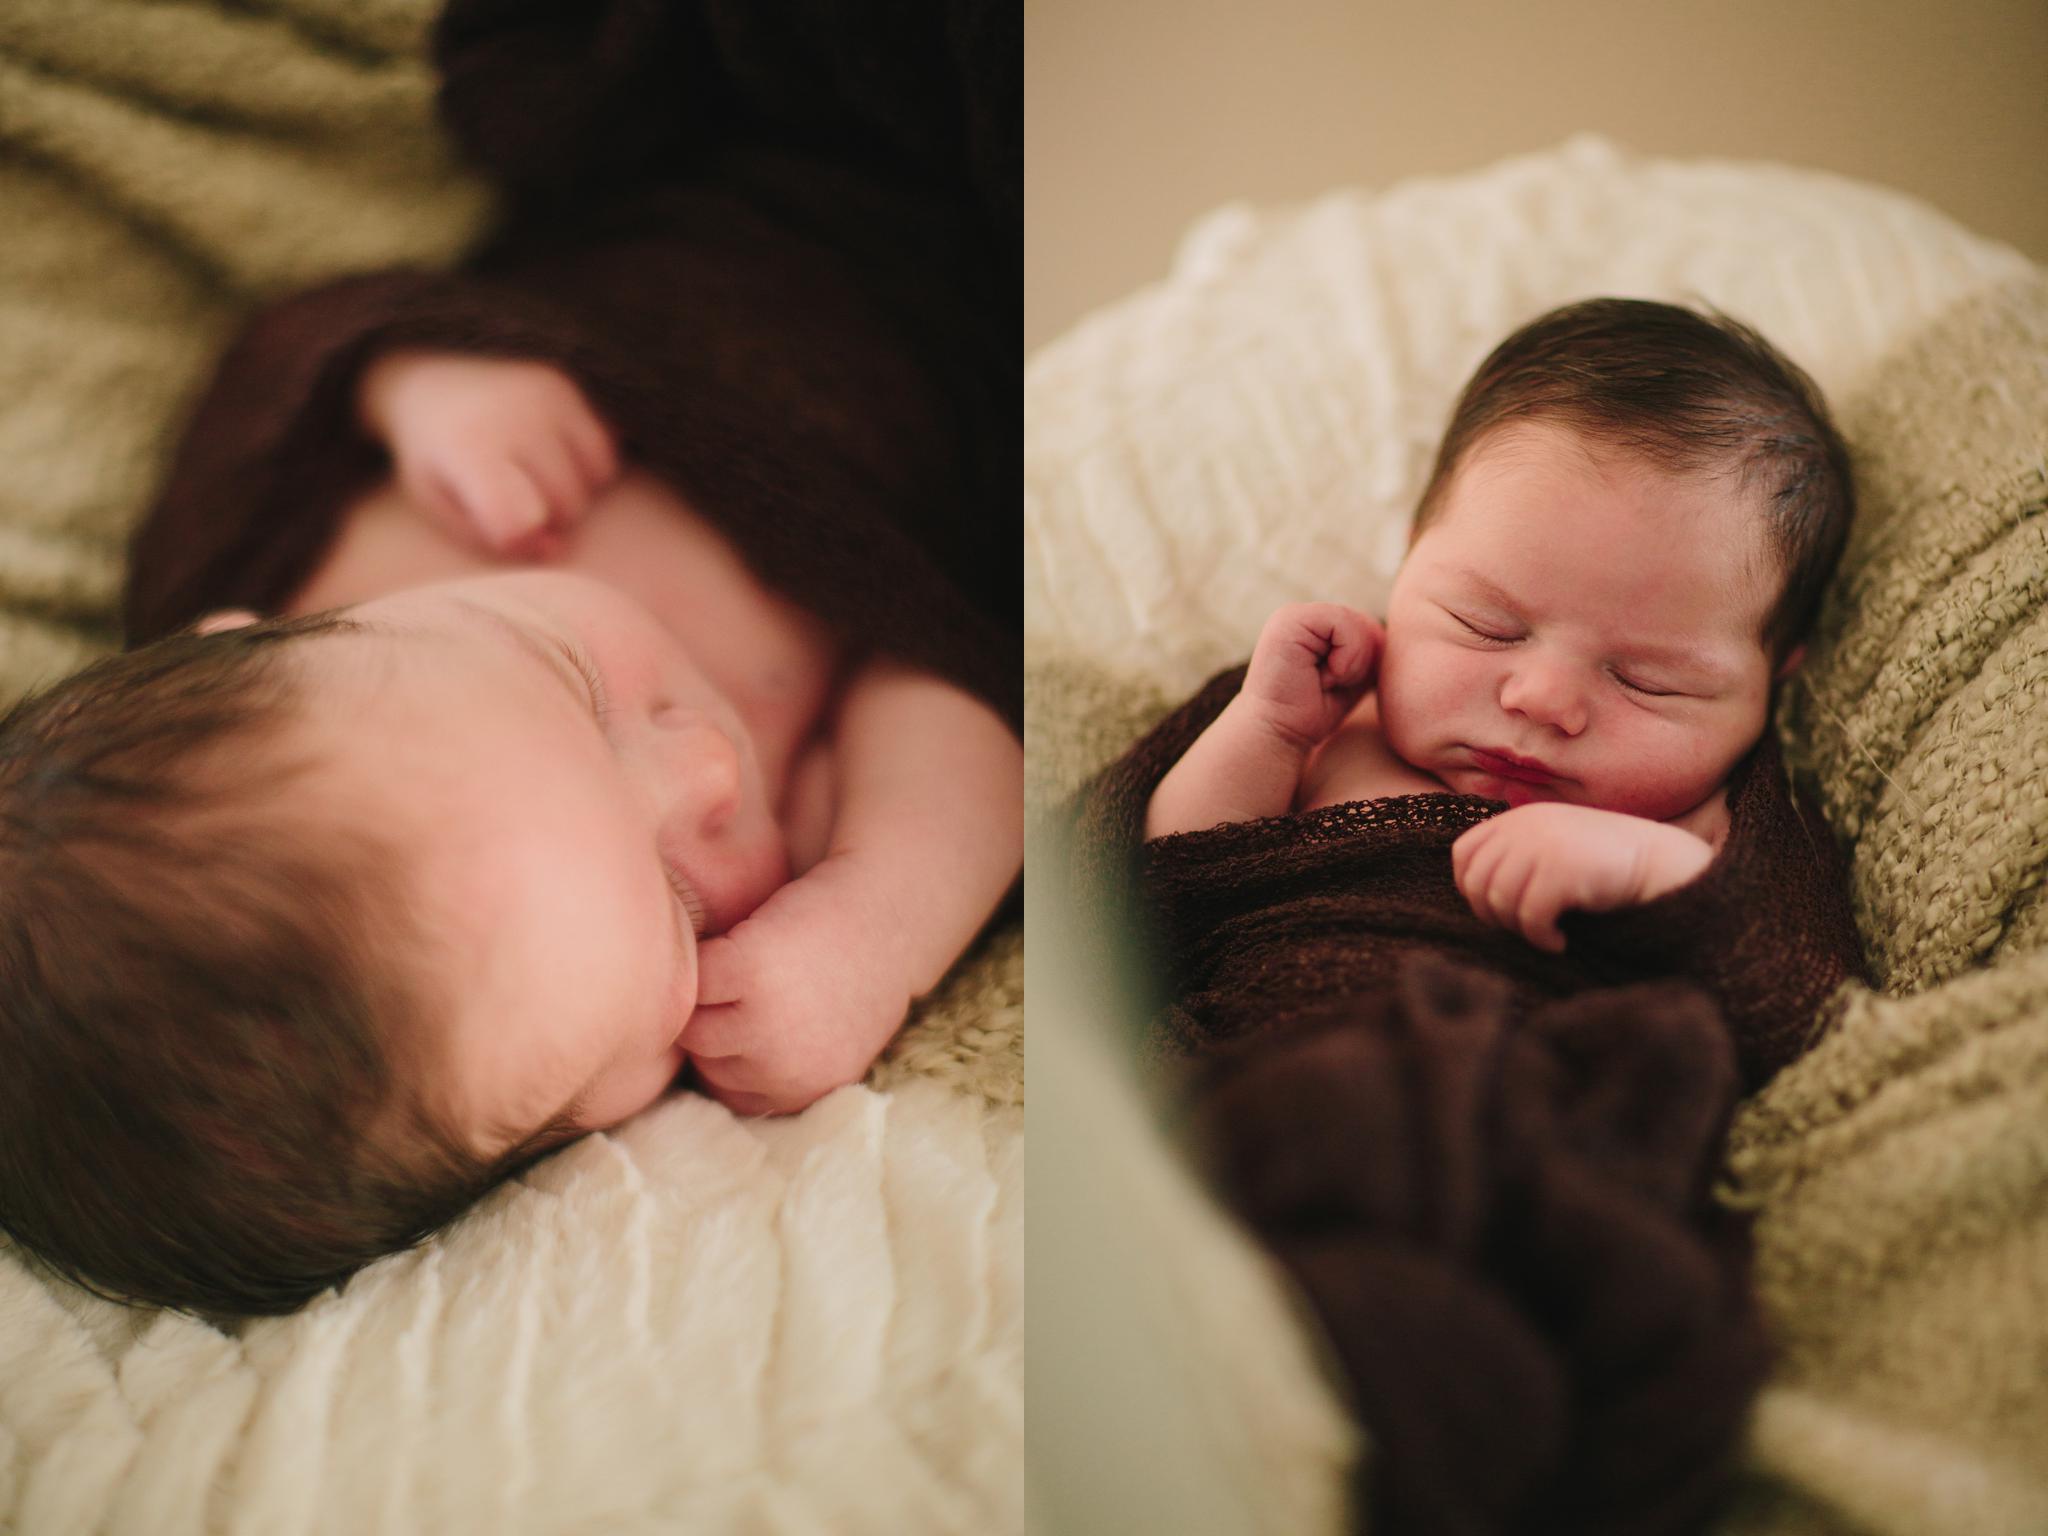 tunkhannock_newborn_photographer_4468.jpg